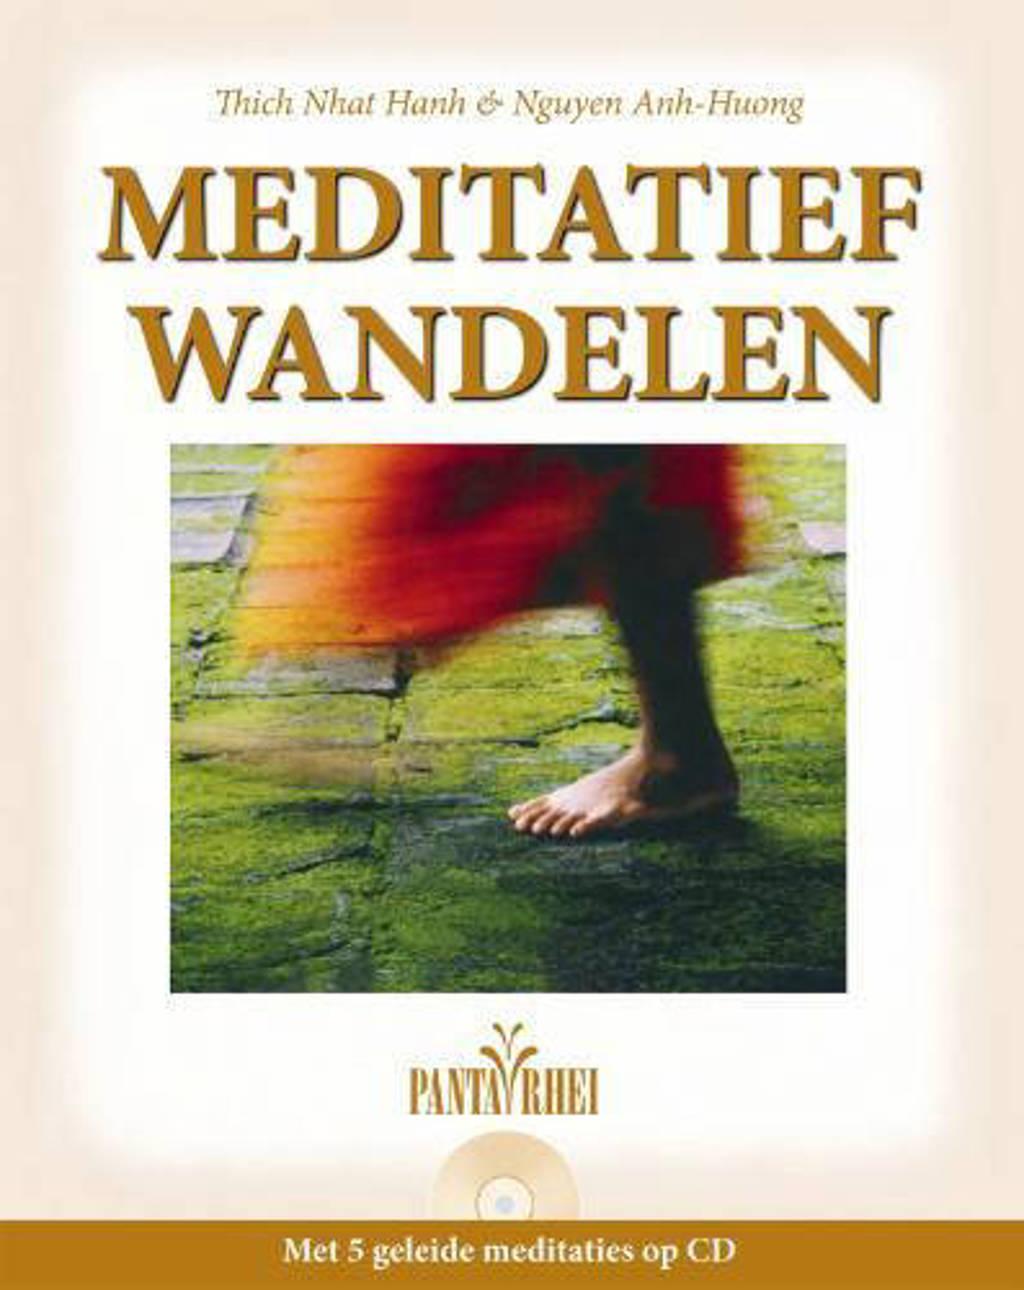 Meditatief wandelen - Nguyen Anh-Huong en Thich Nhat Hahn